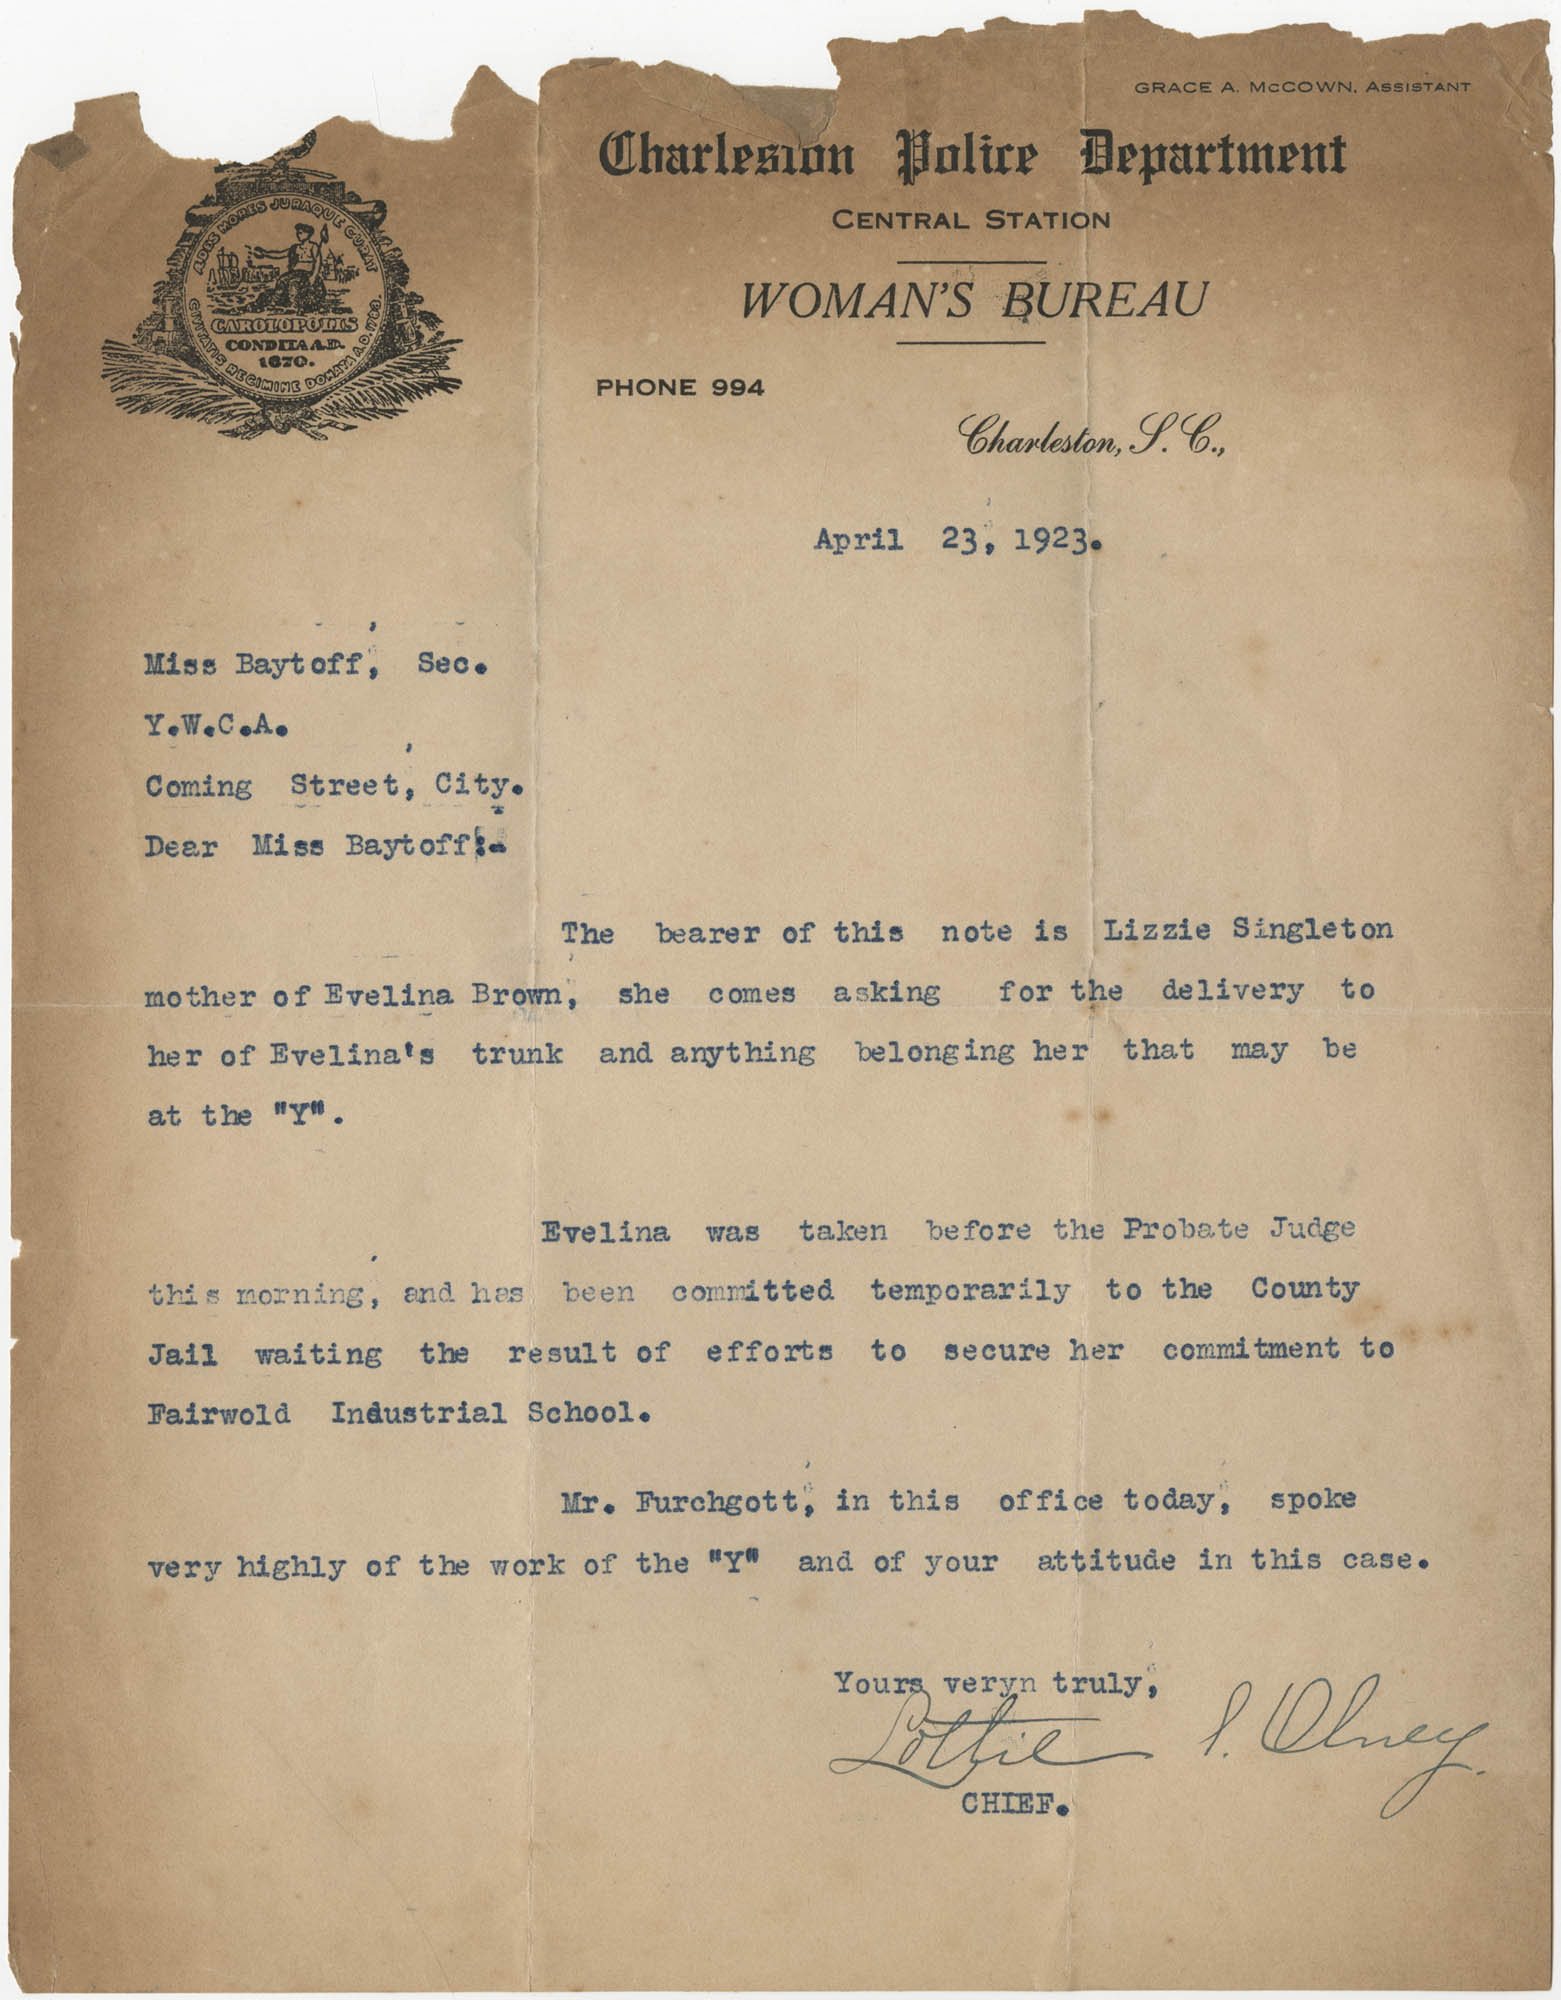 Letter from Lottie I. Olney to Ada C. Baytop, April 23, 1923